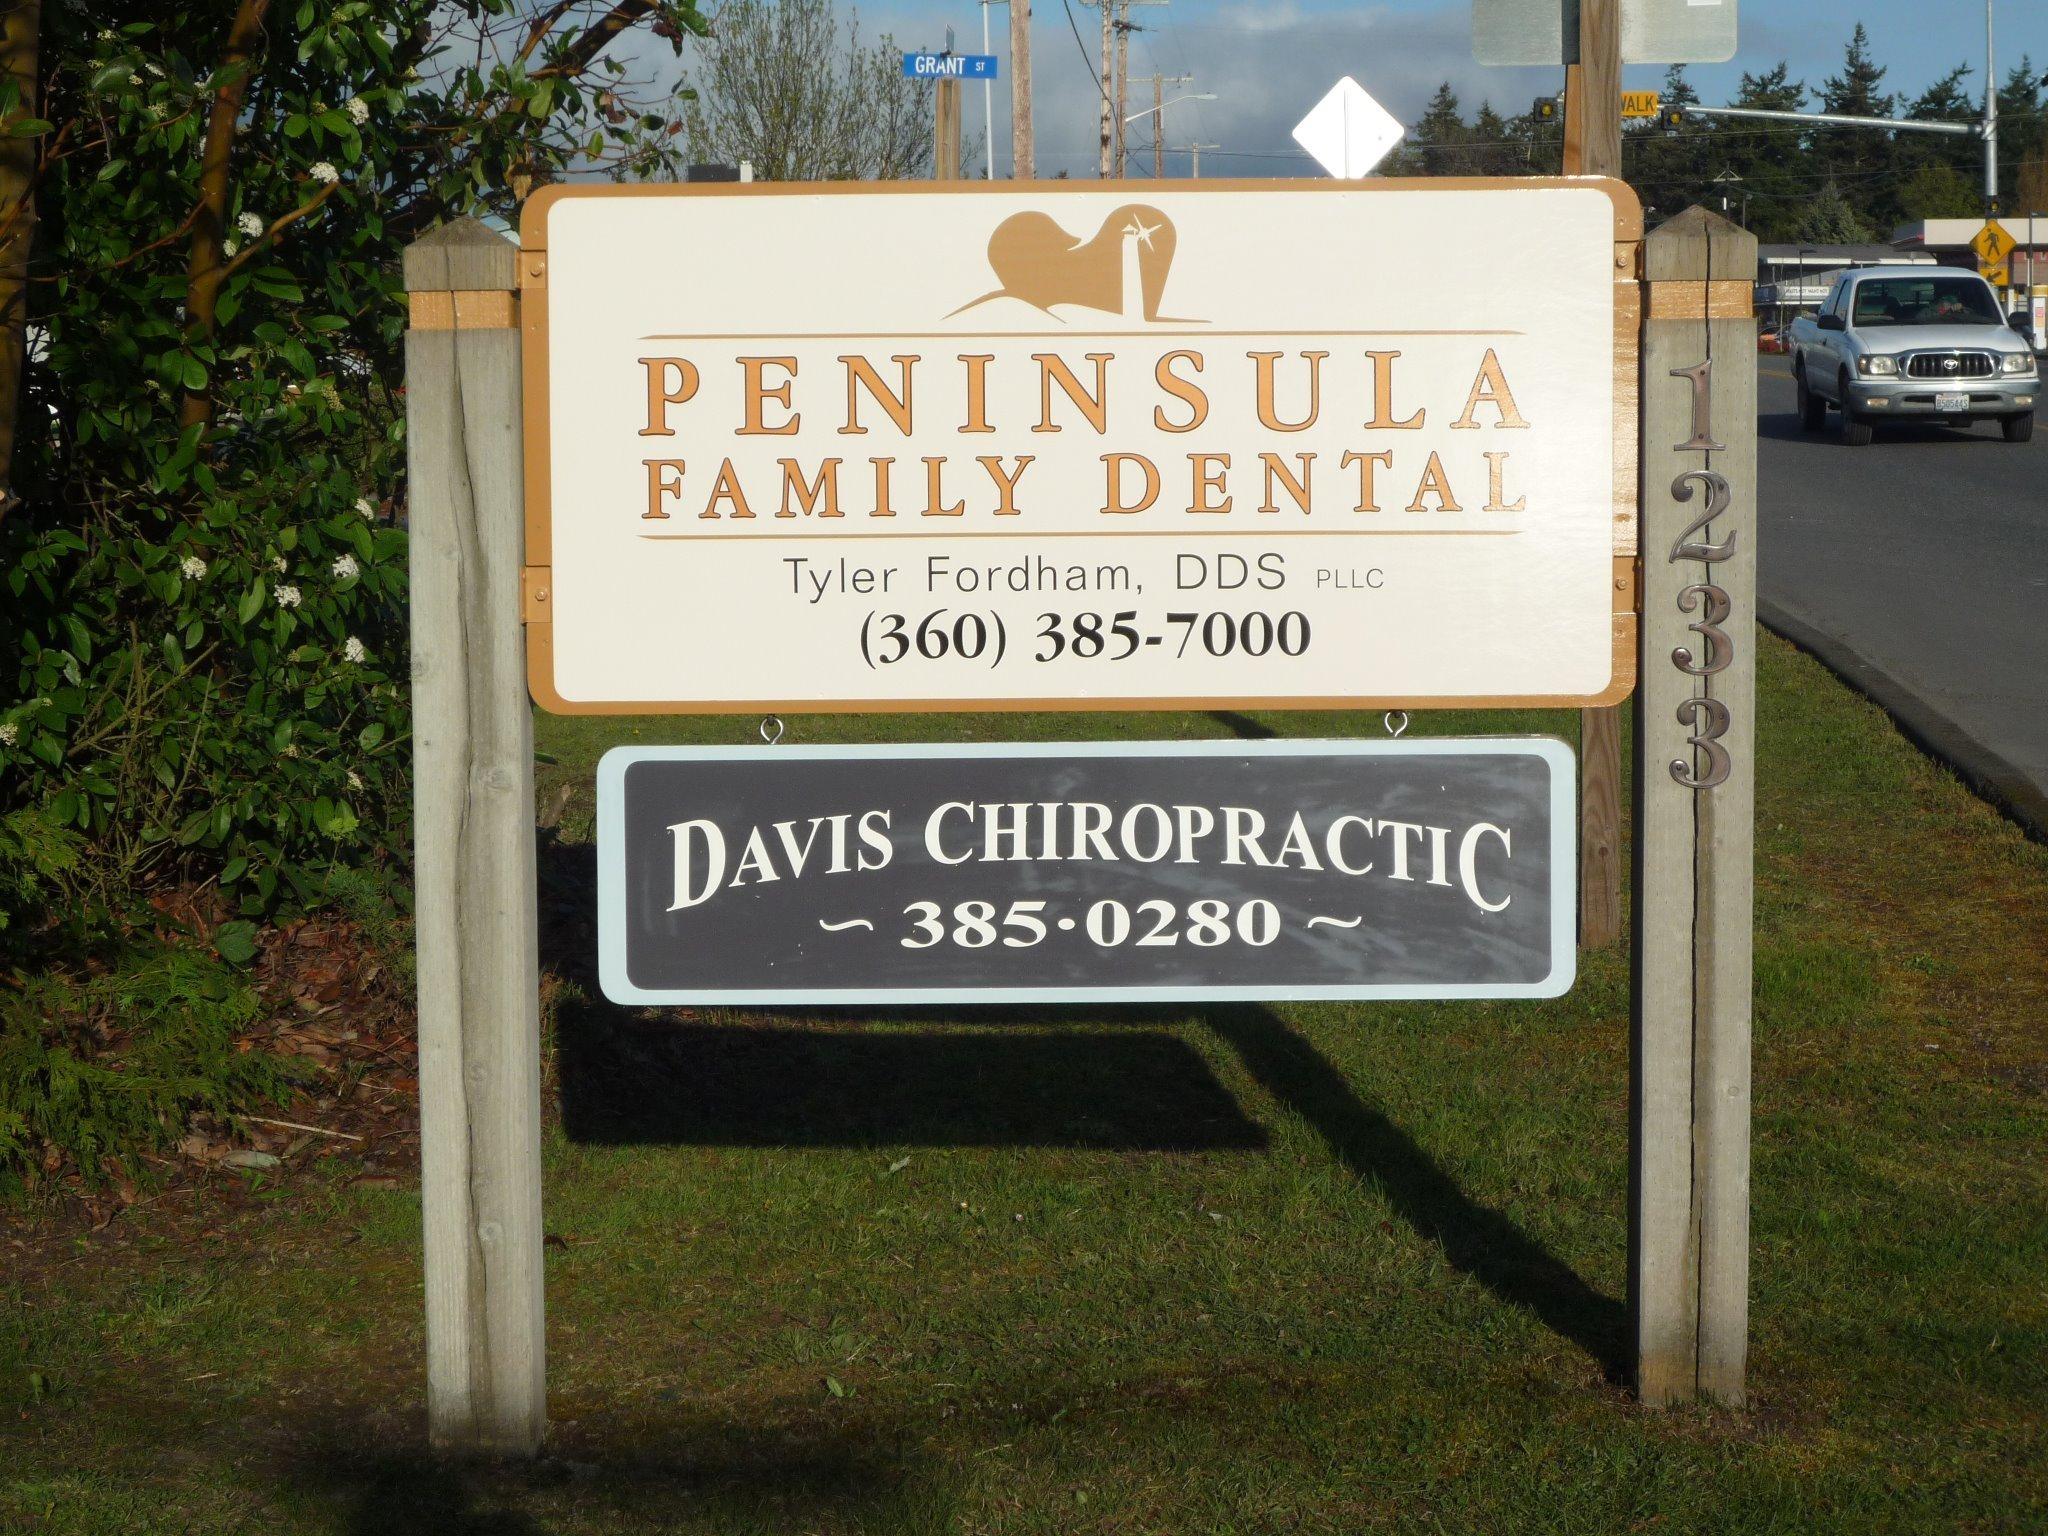 Peninsula Family Dental image 1